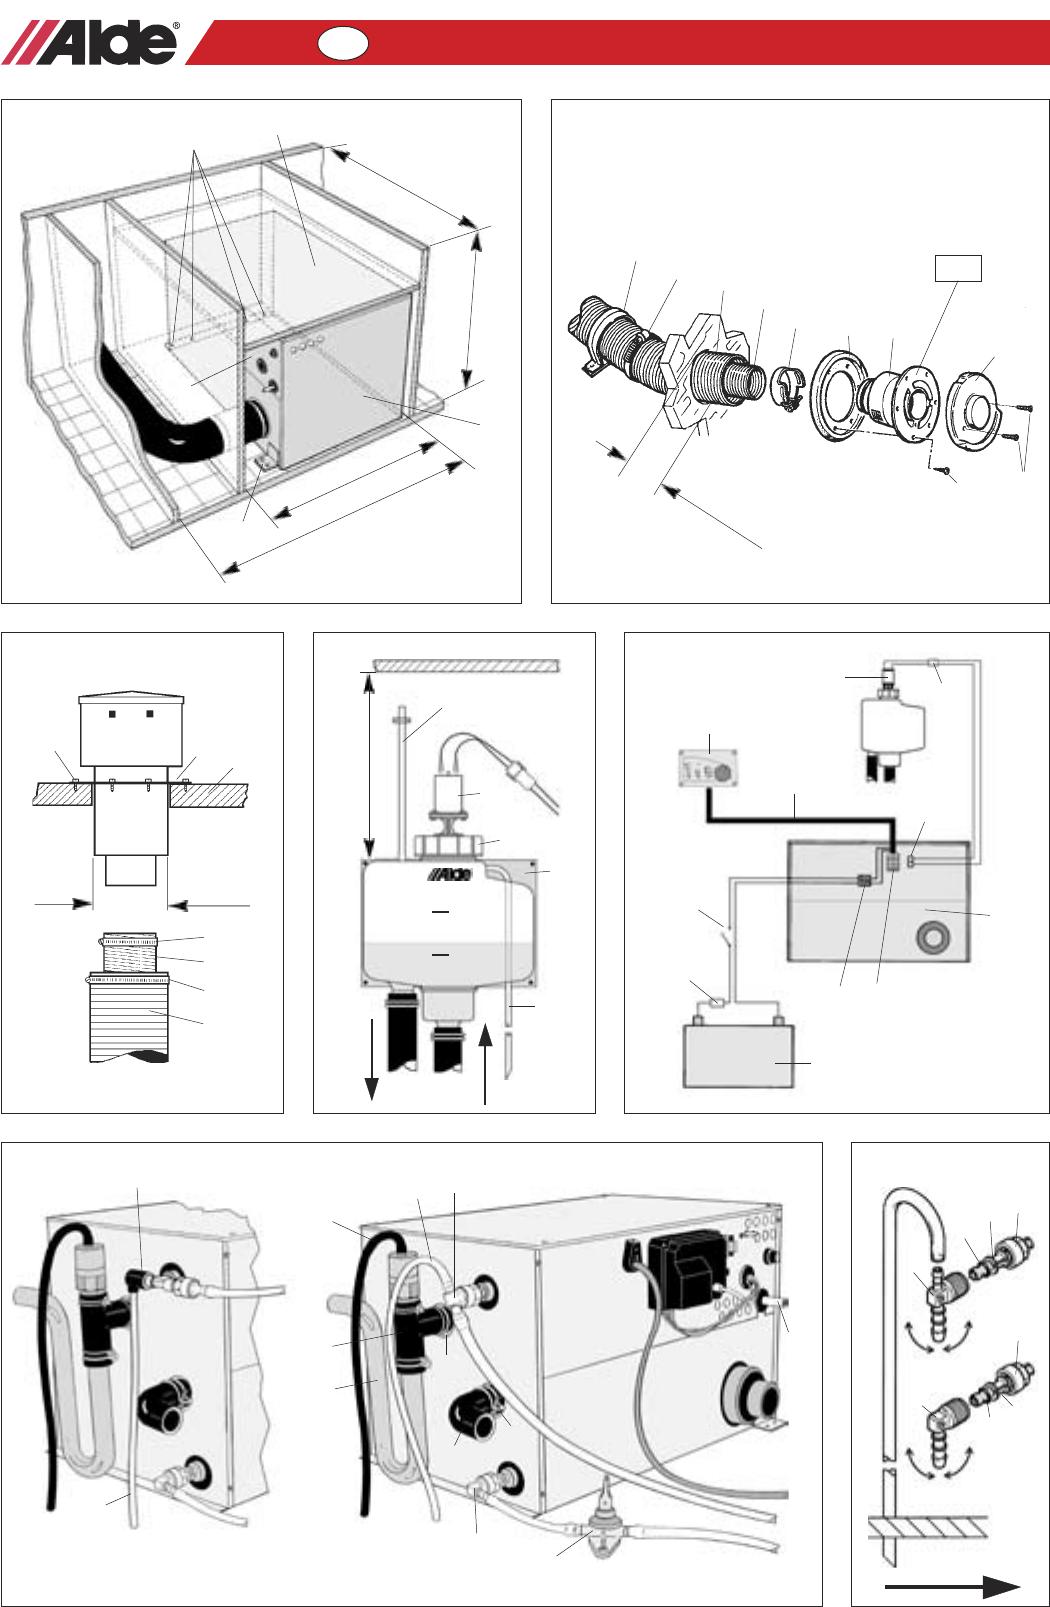 Alde compact 3000 92x service manual pdf download.